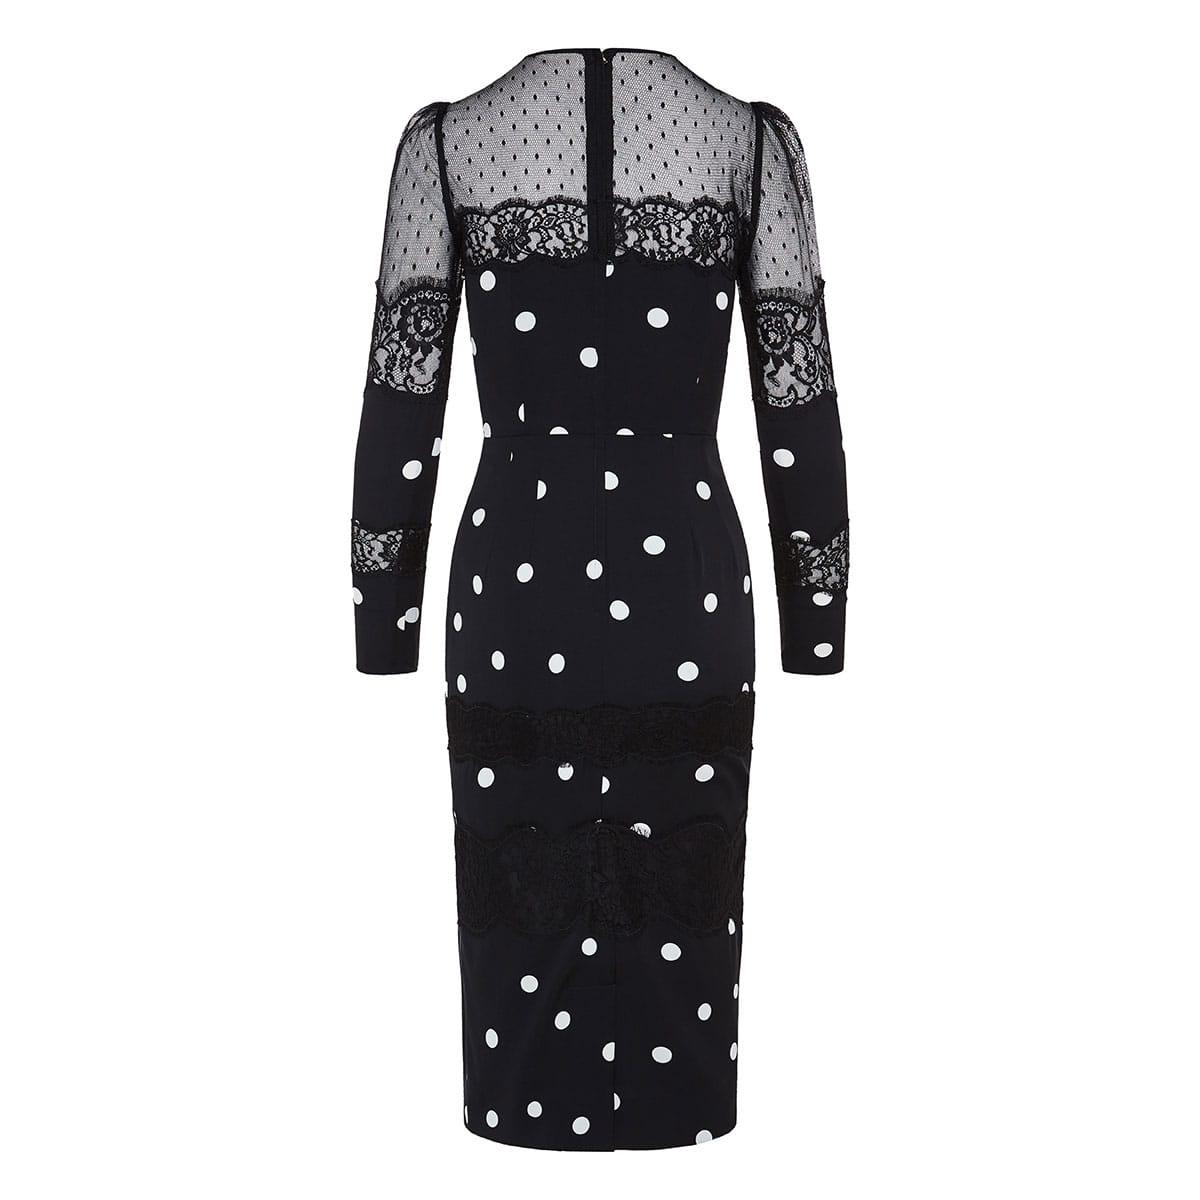 Lace-paneled polka-dot midi dress